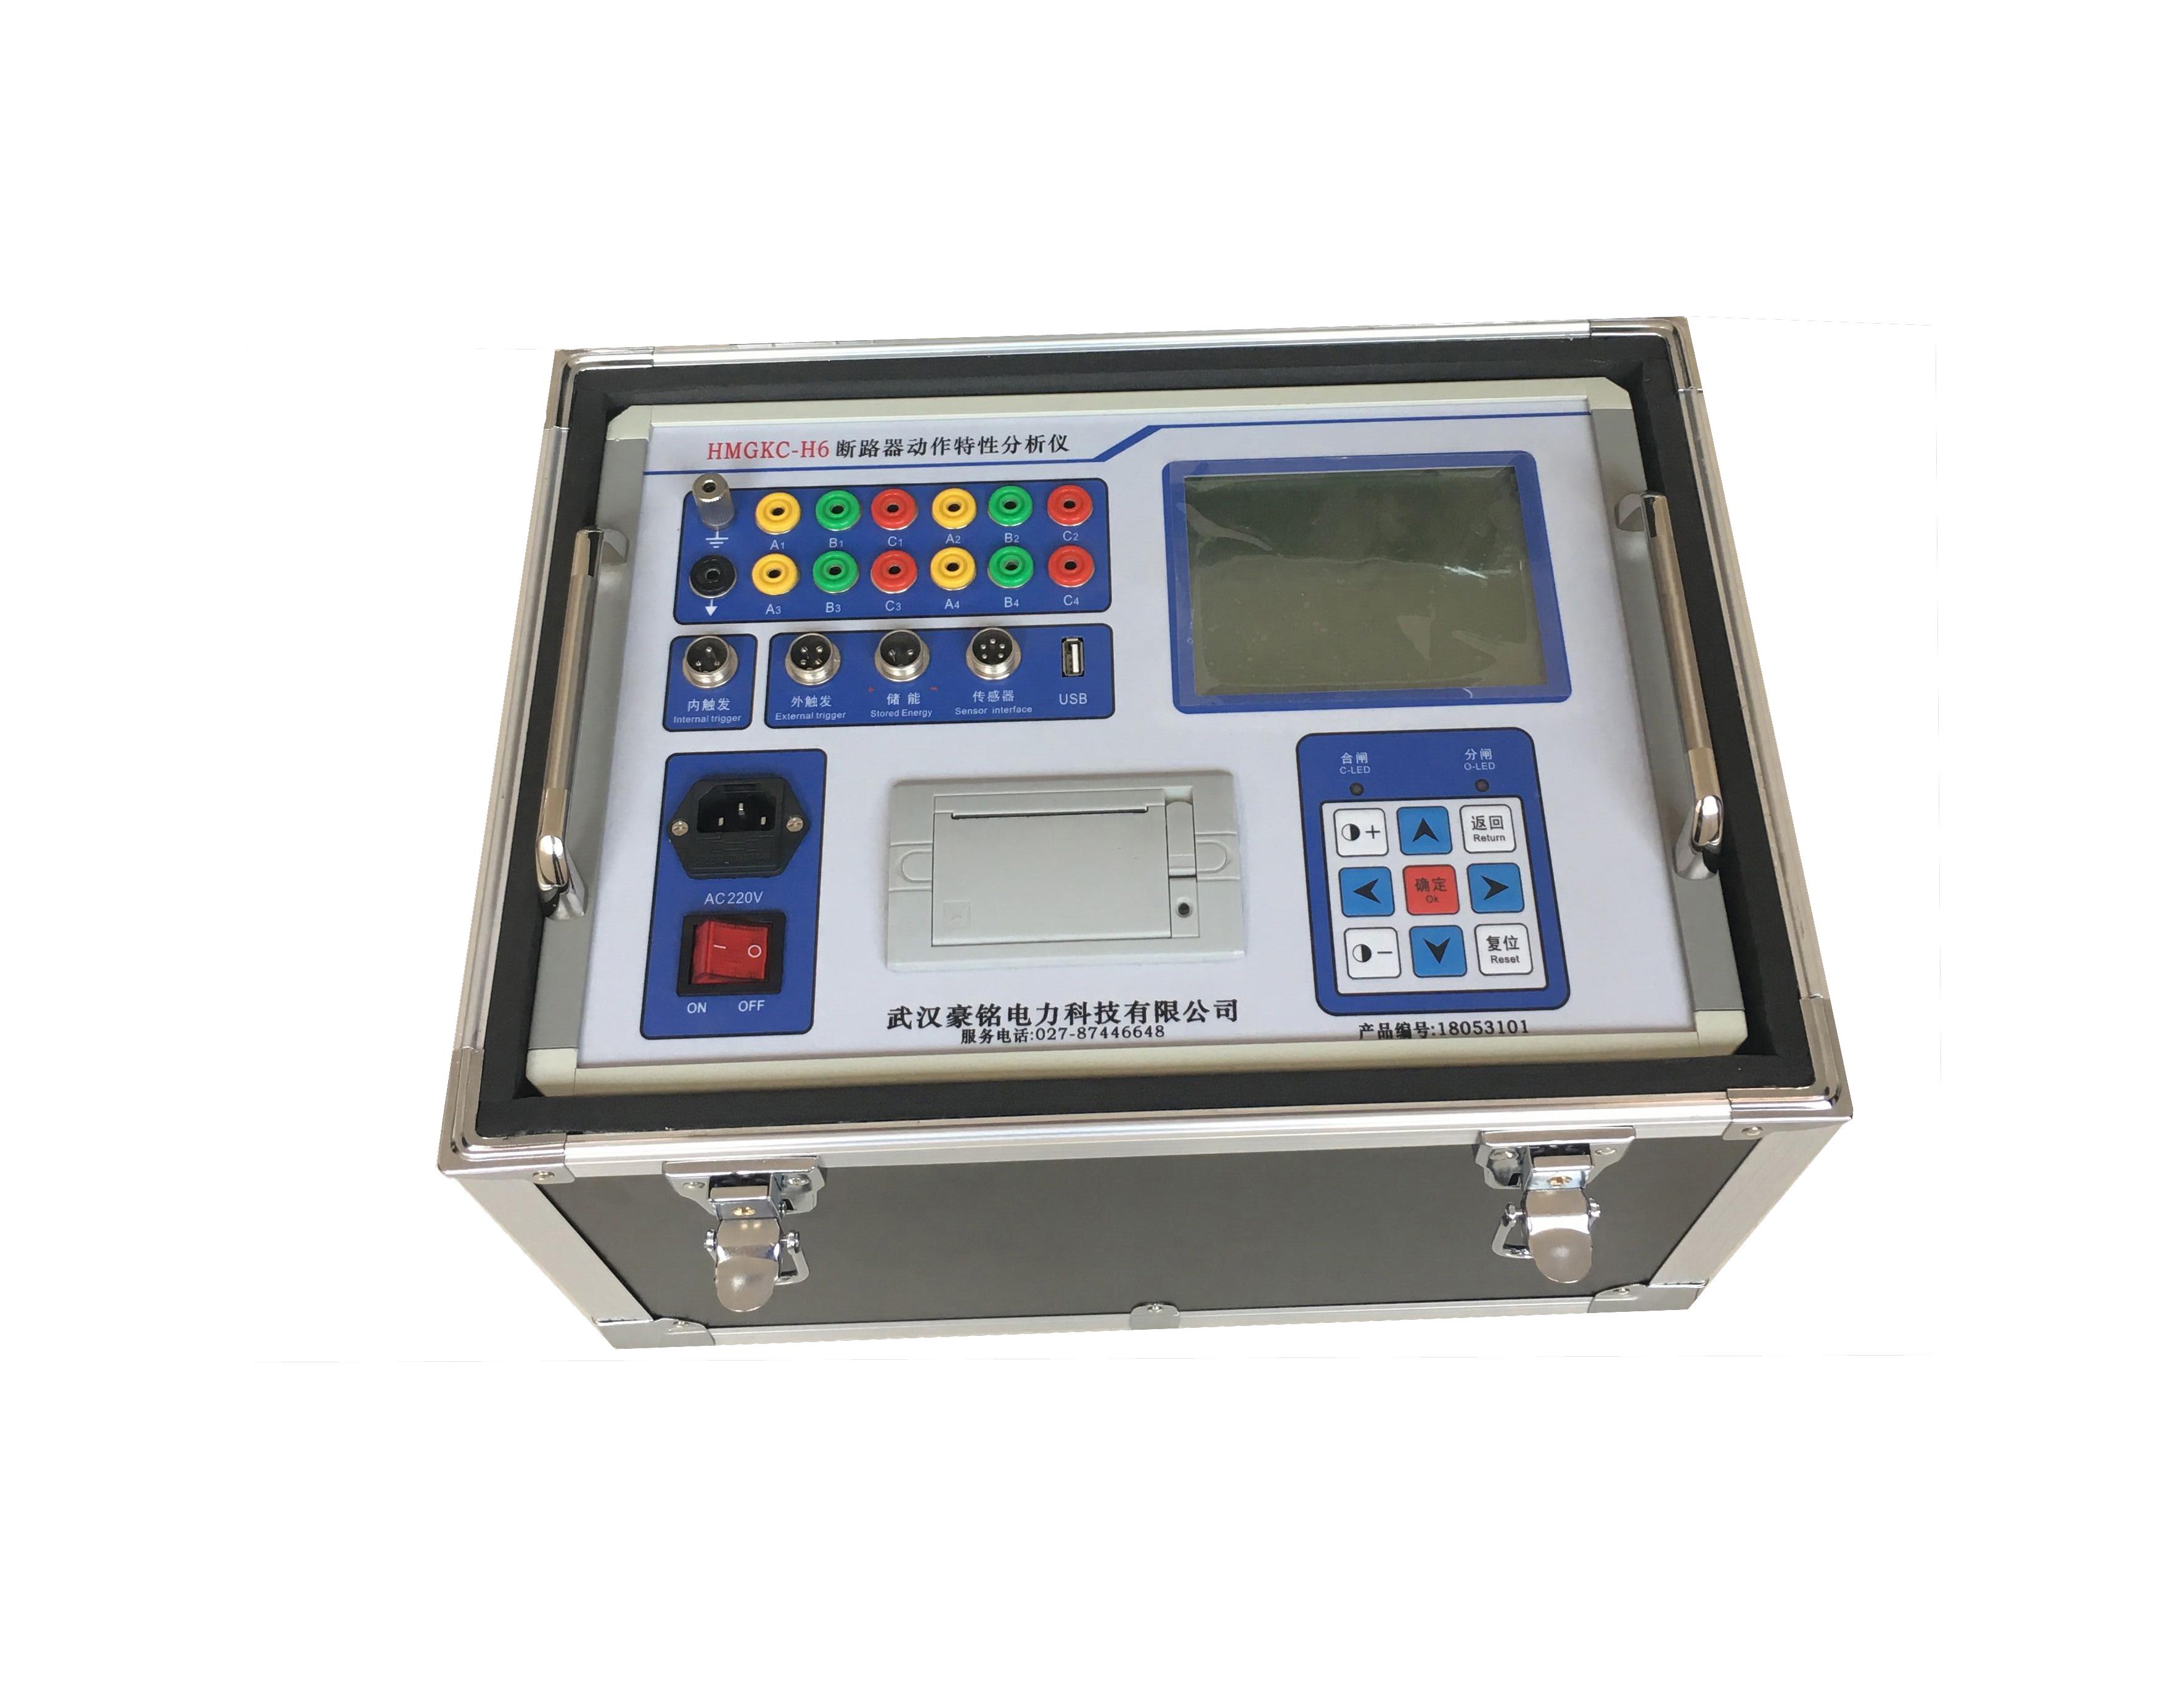 HMGKC-H6斷路器動作特性分析儀